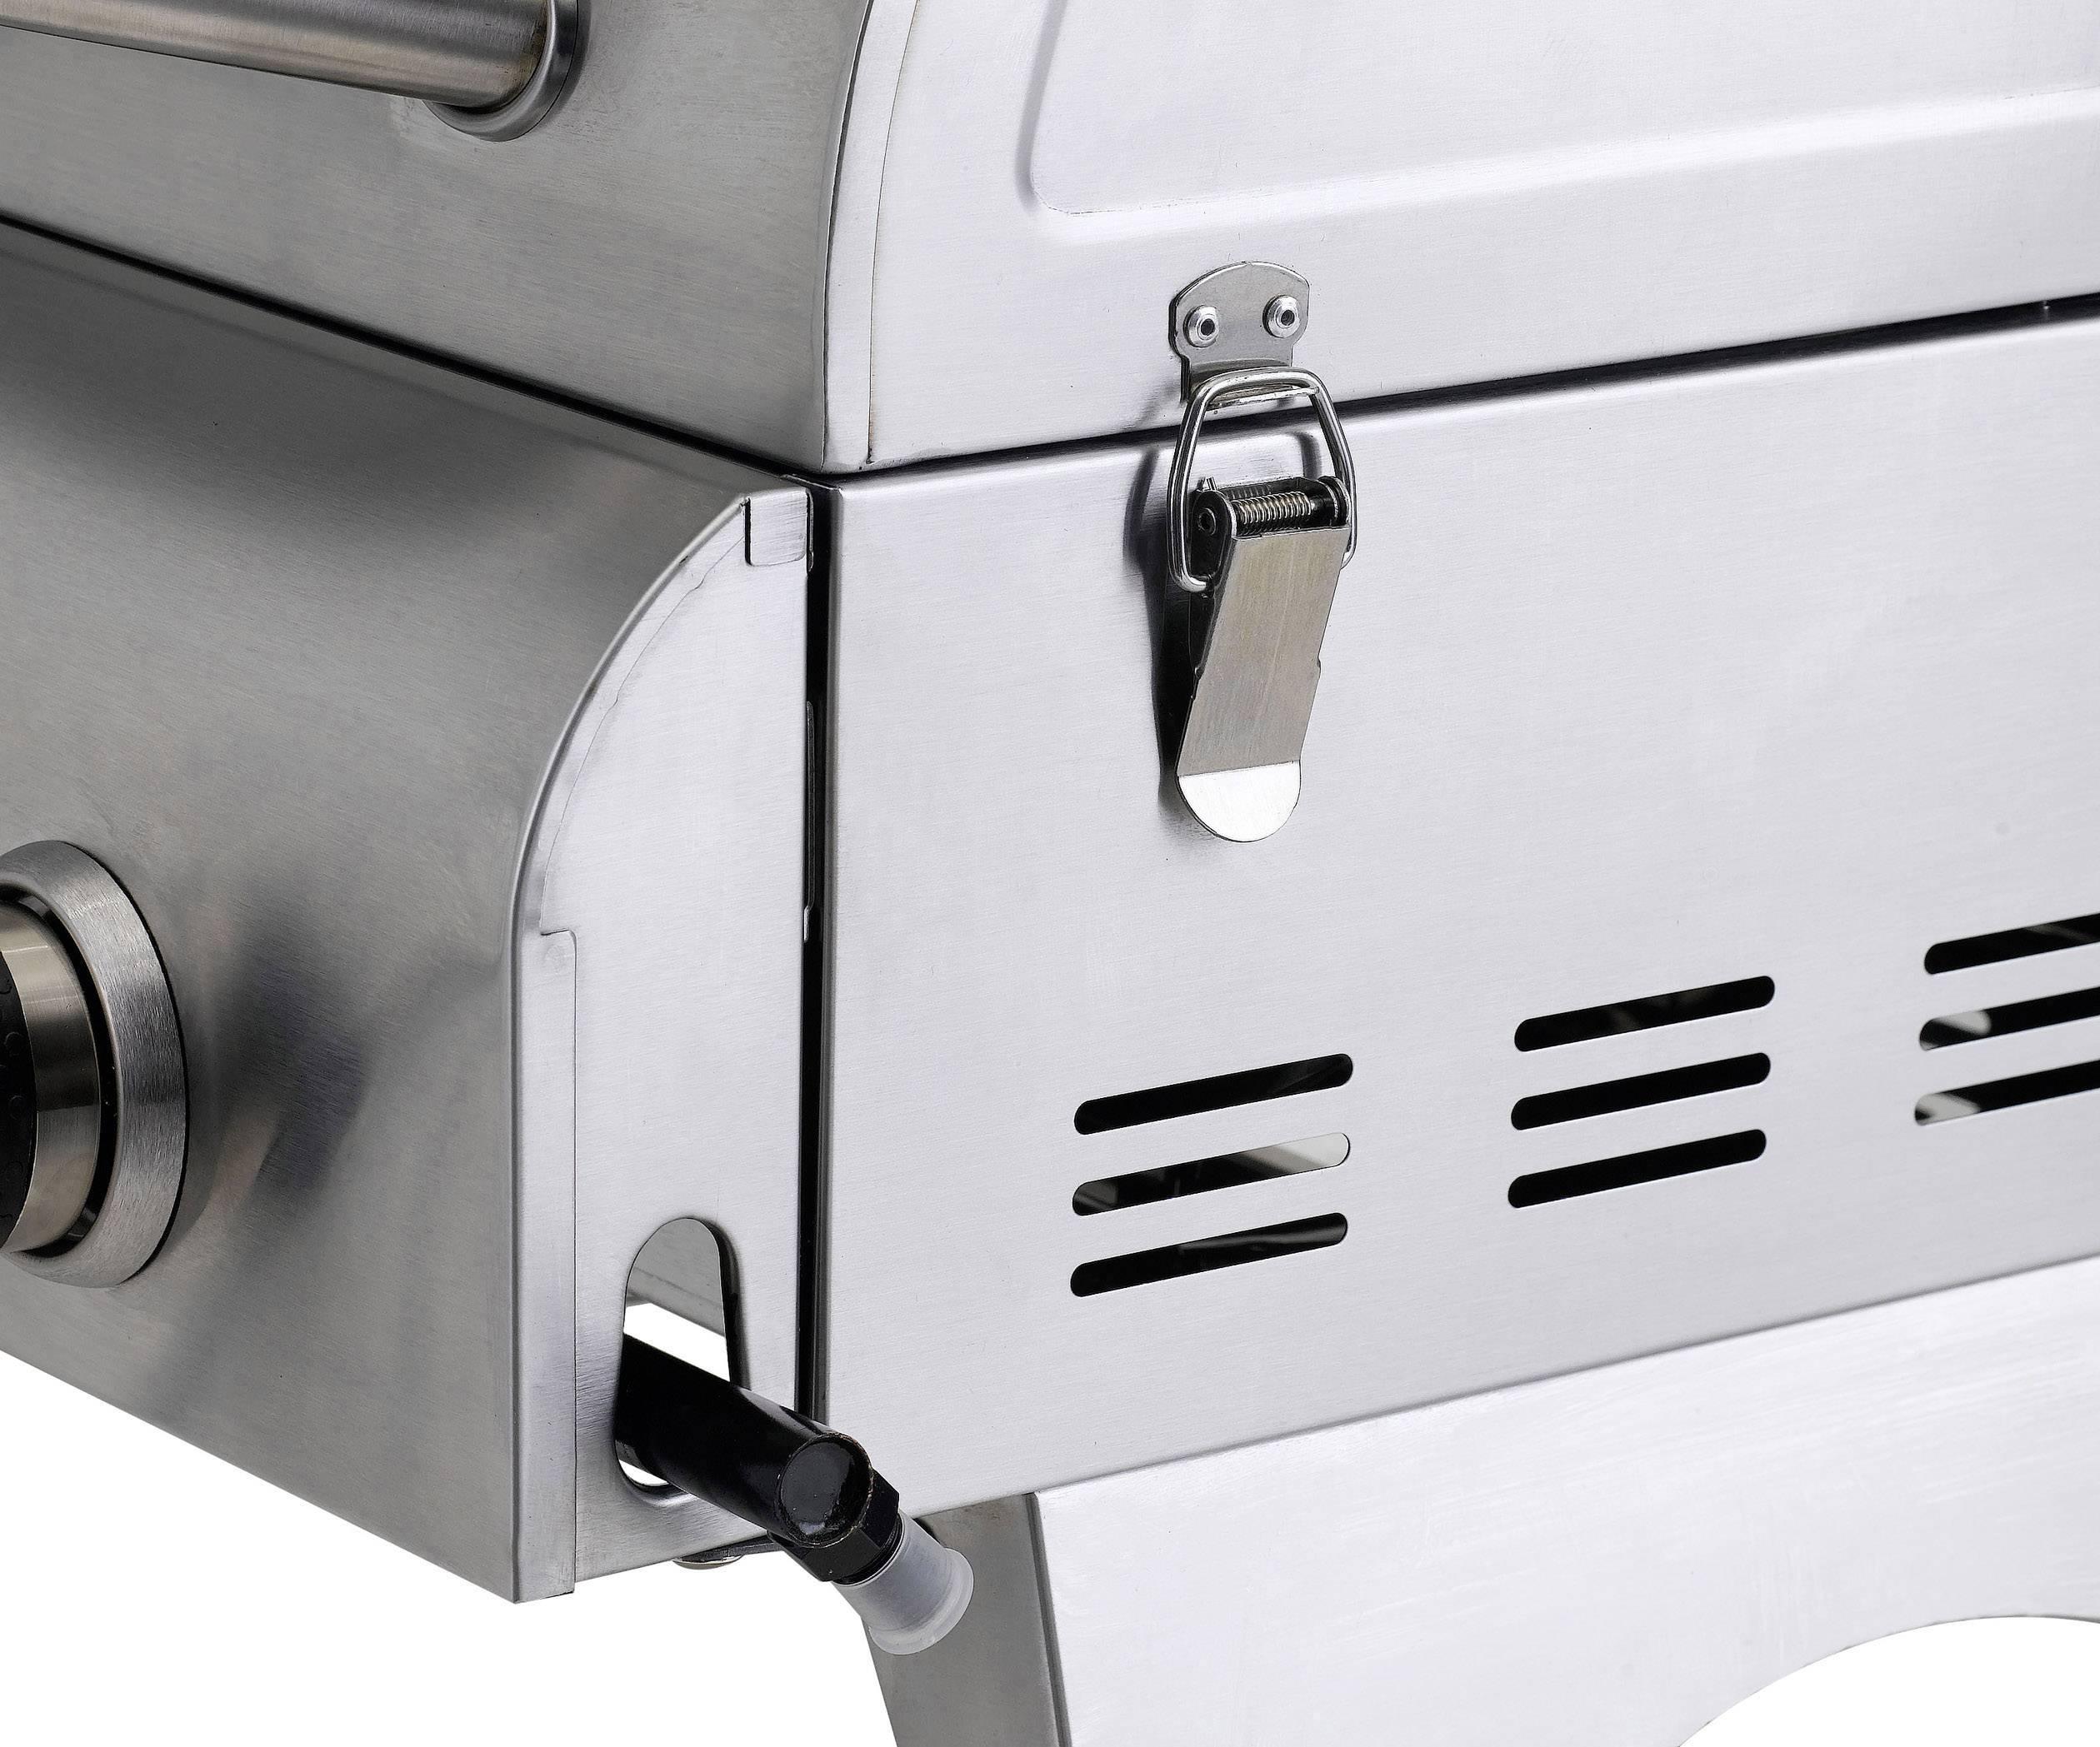 Tisch Für Gasgrill : Landmann portabler gasgrill